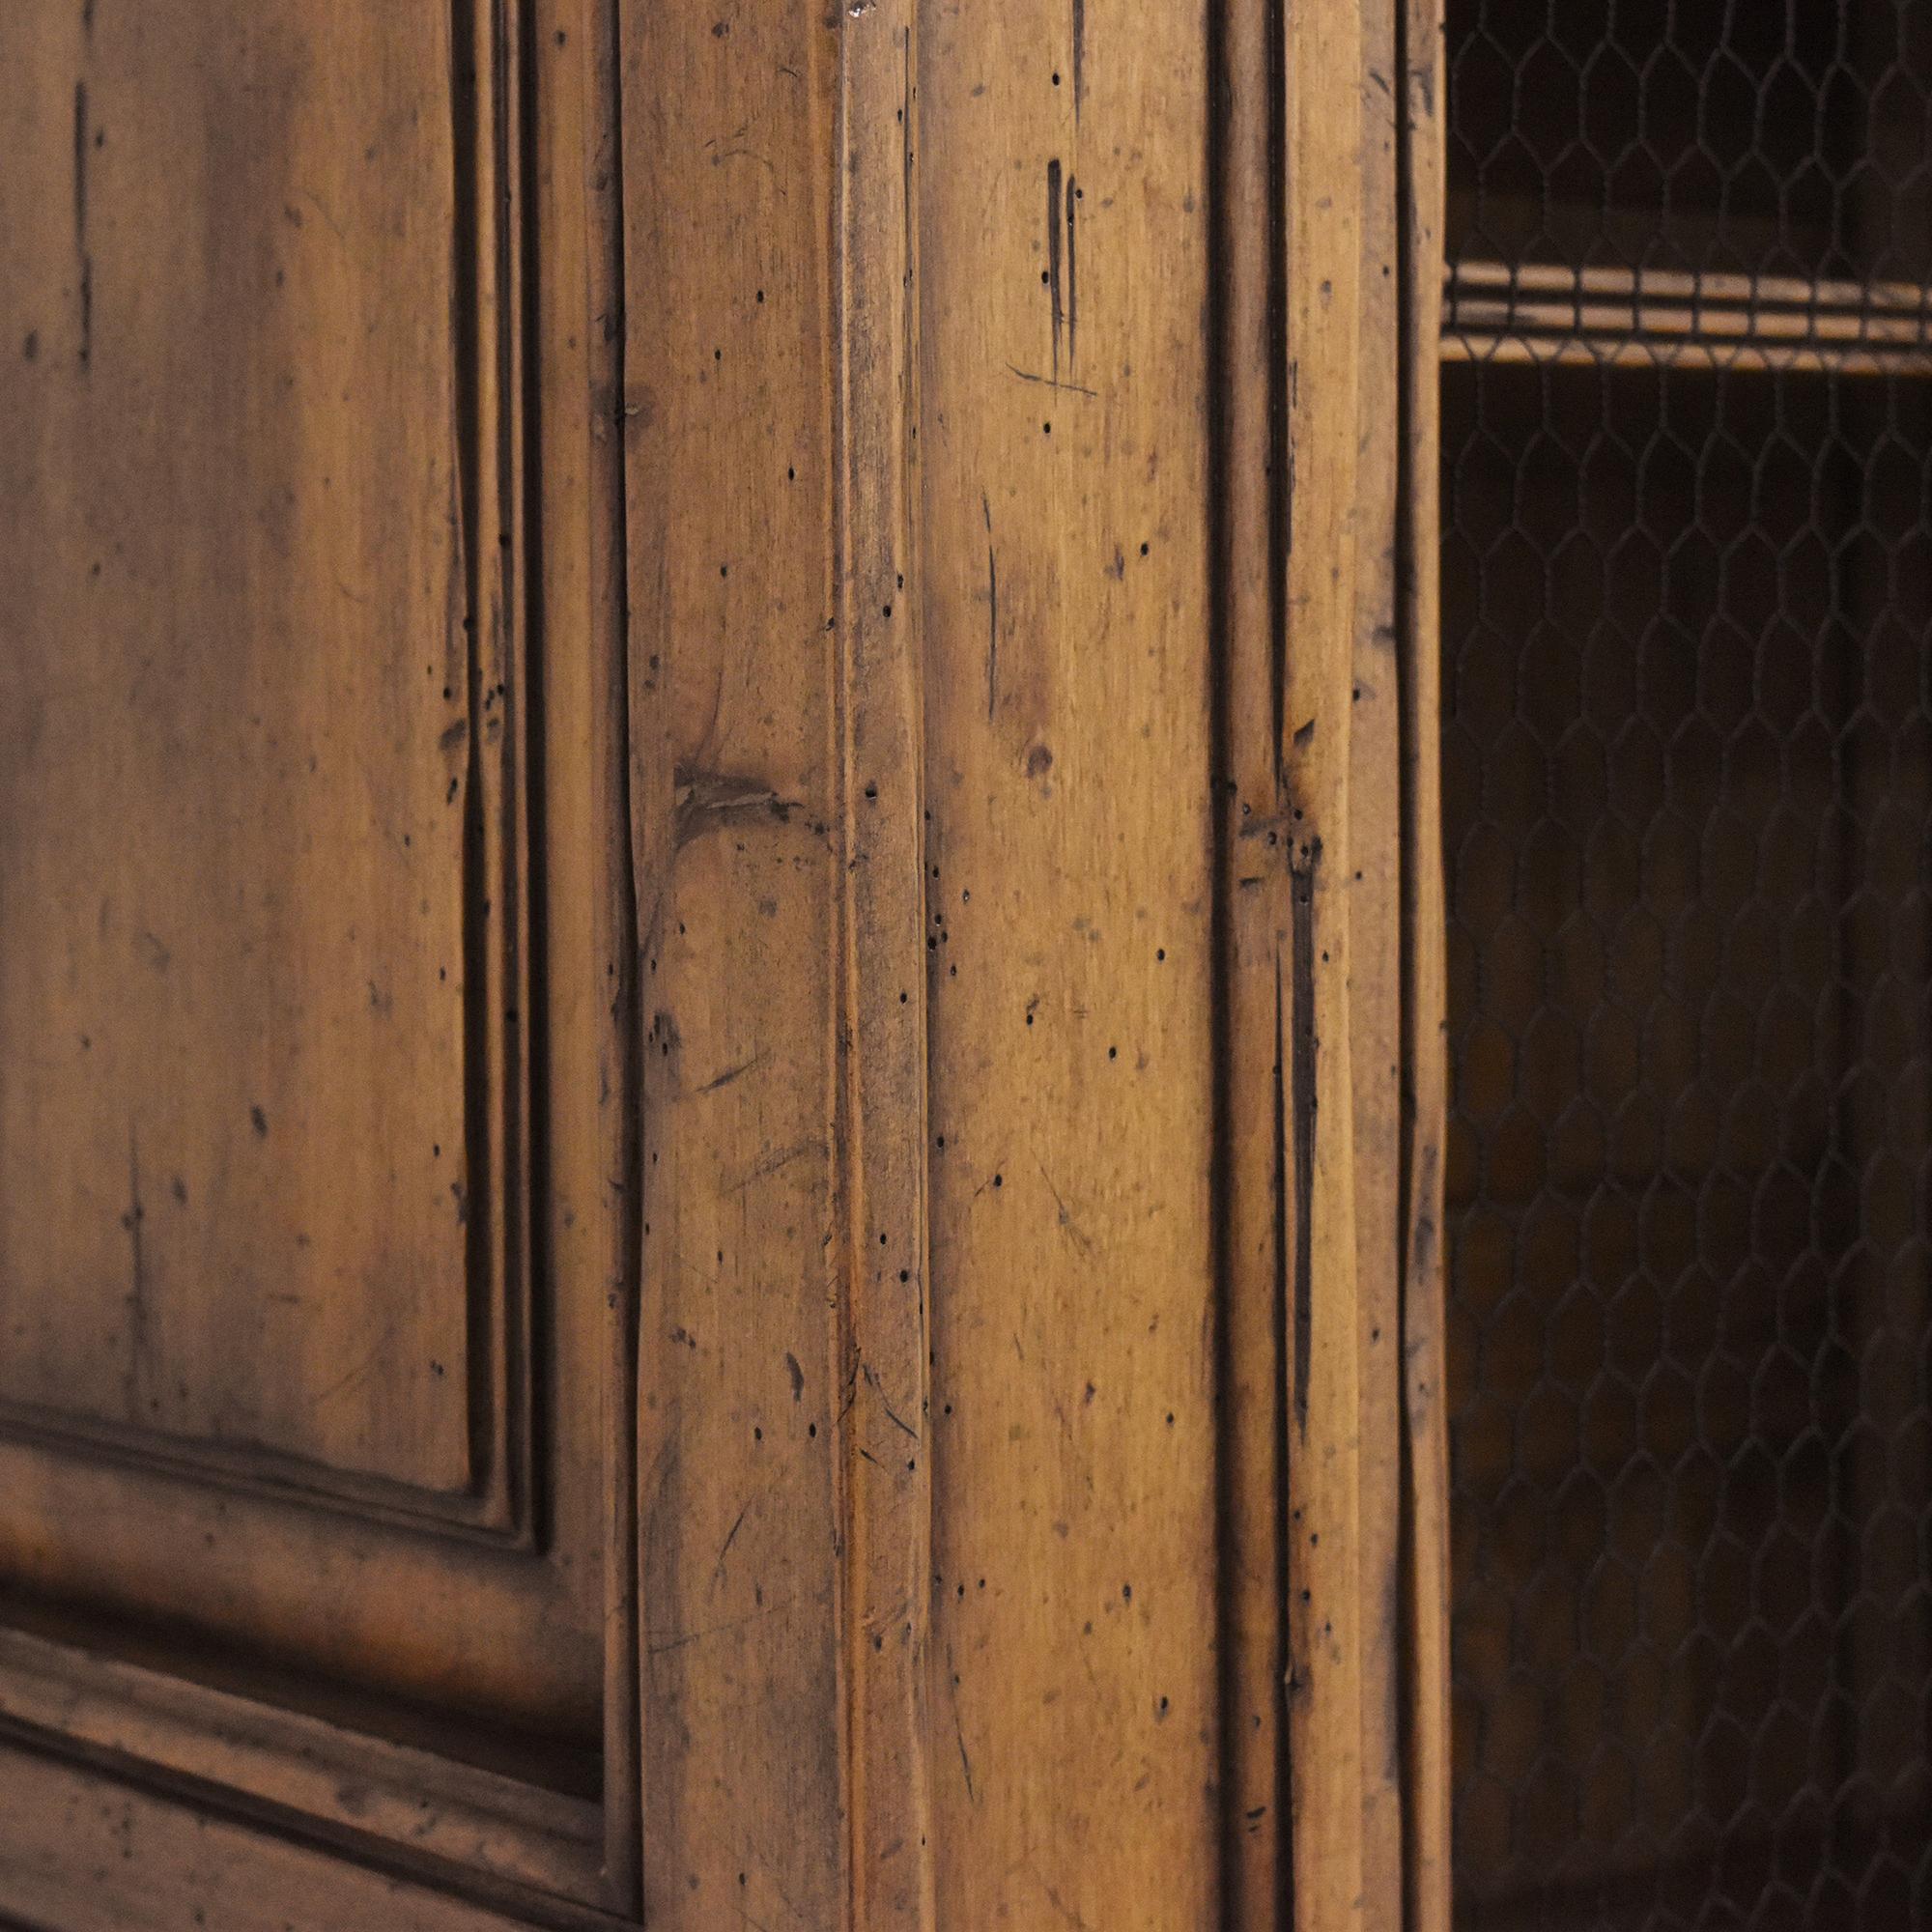 Guy Chaddock & Co. Guy Chaddock & Co. Hutch Cabinet dimensions